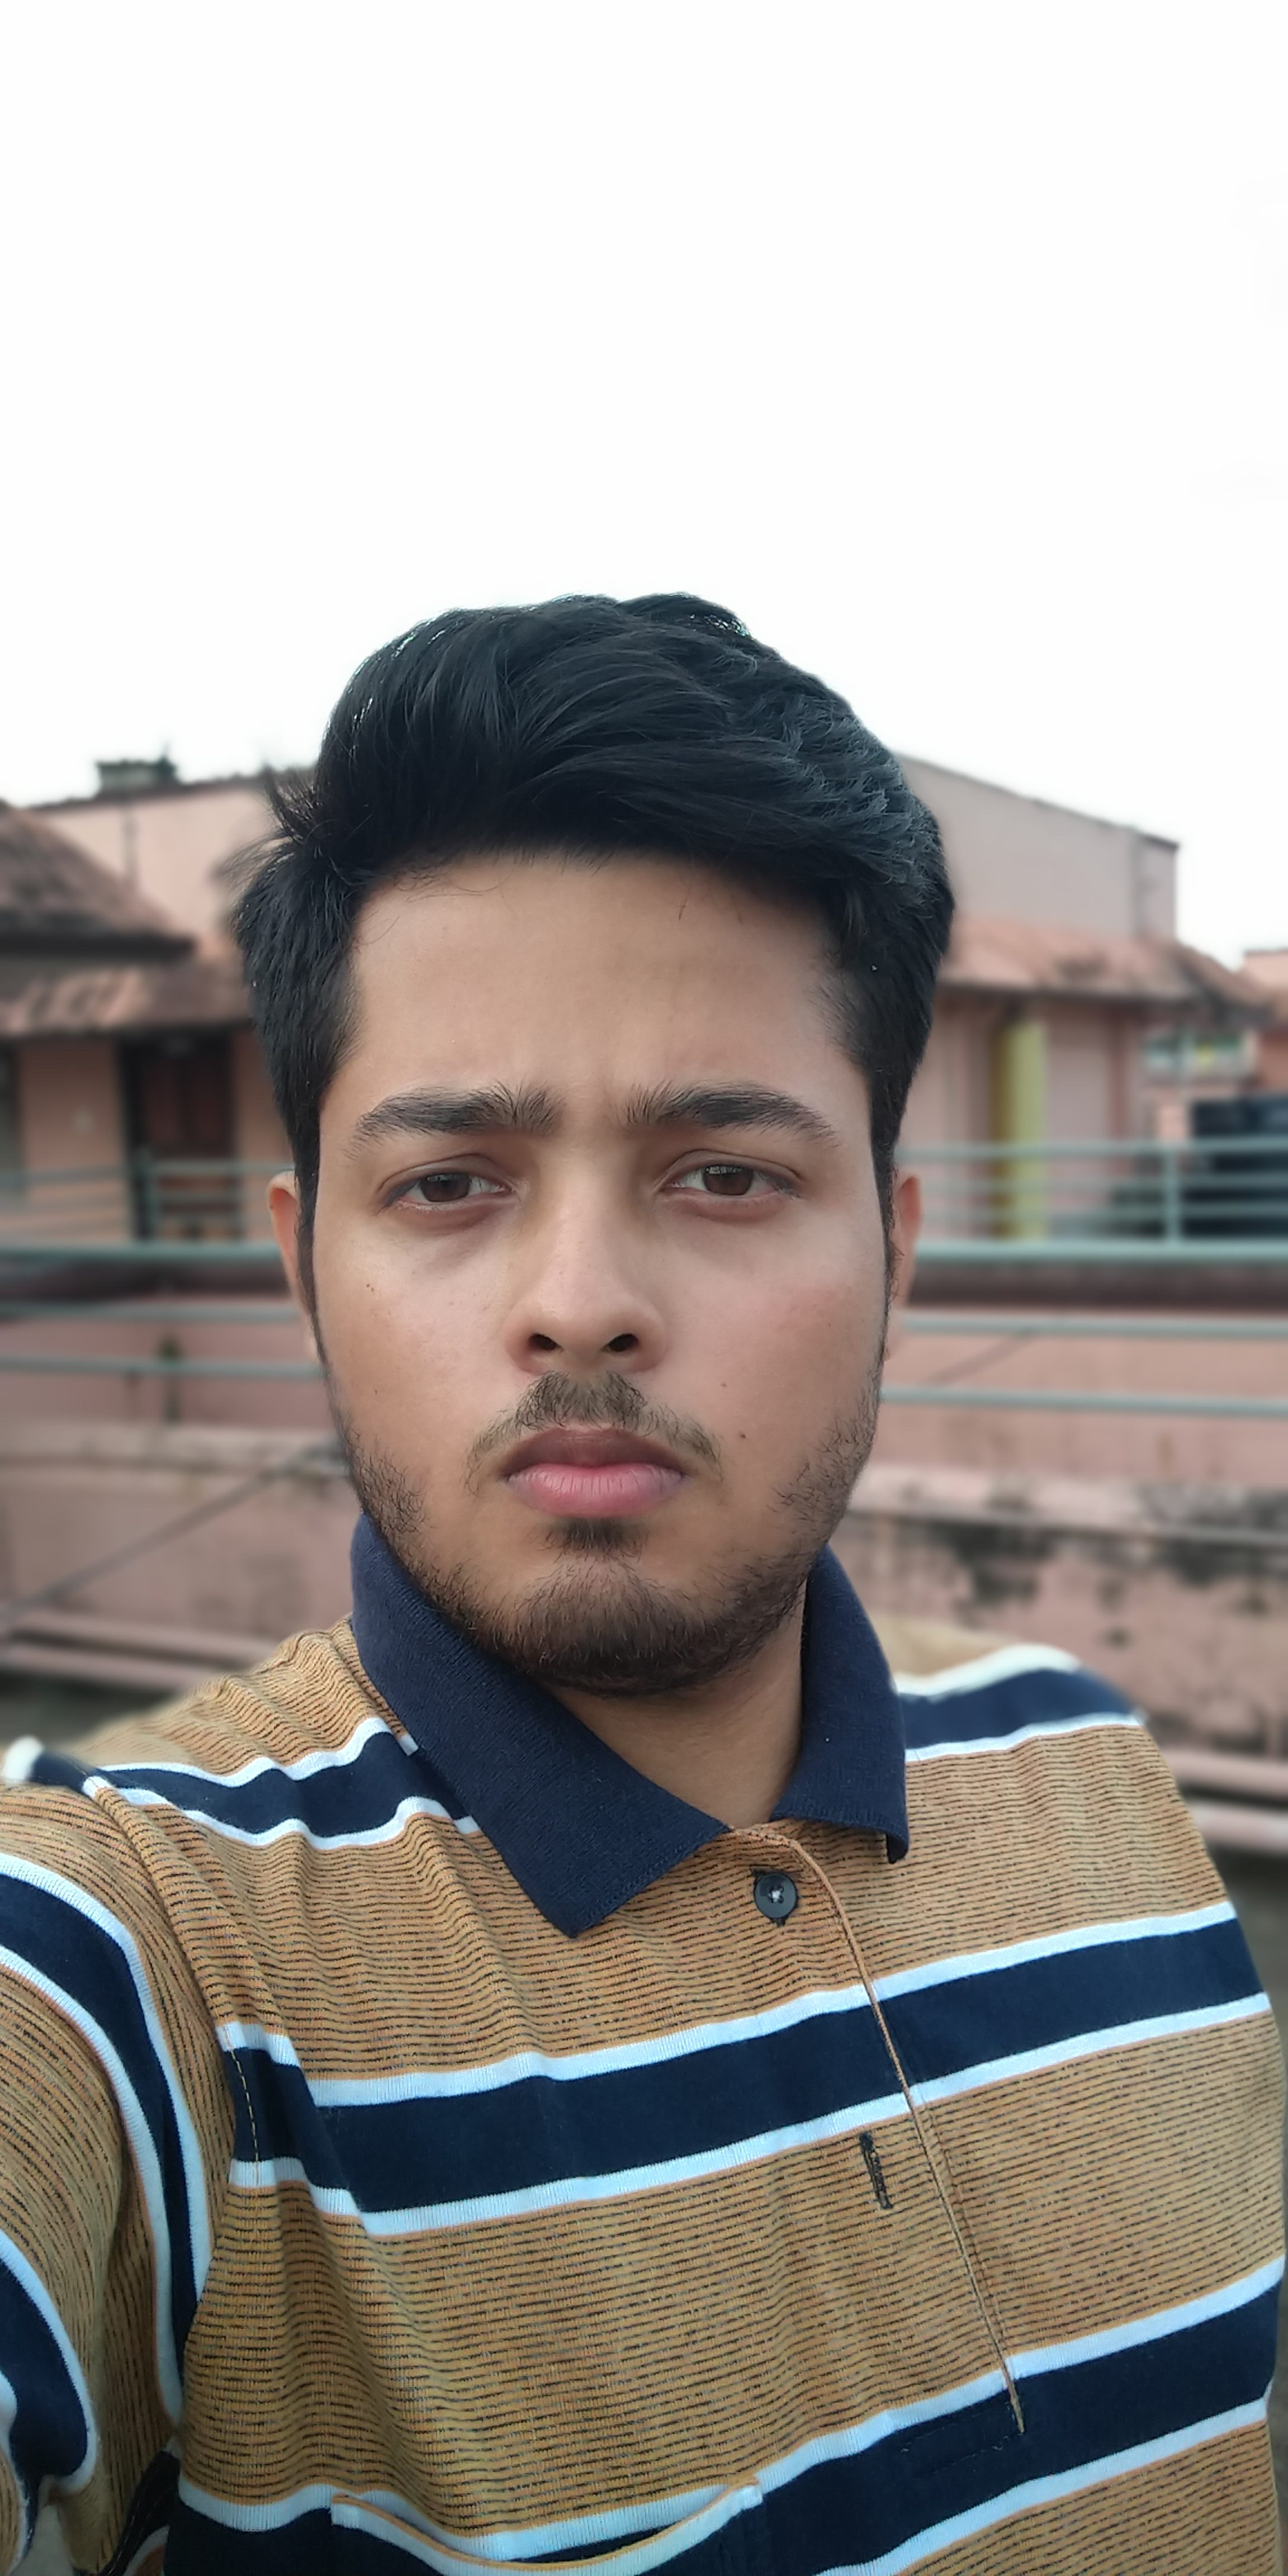 Selfie with Live Bokeh